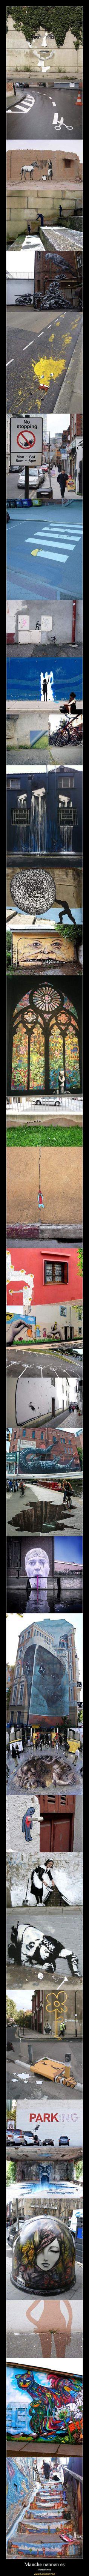 Cool #graffiti